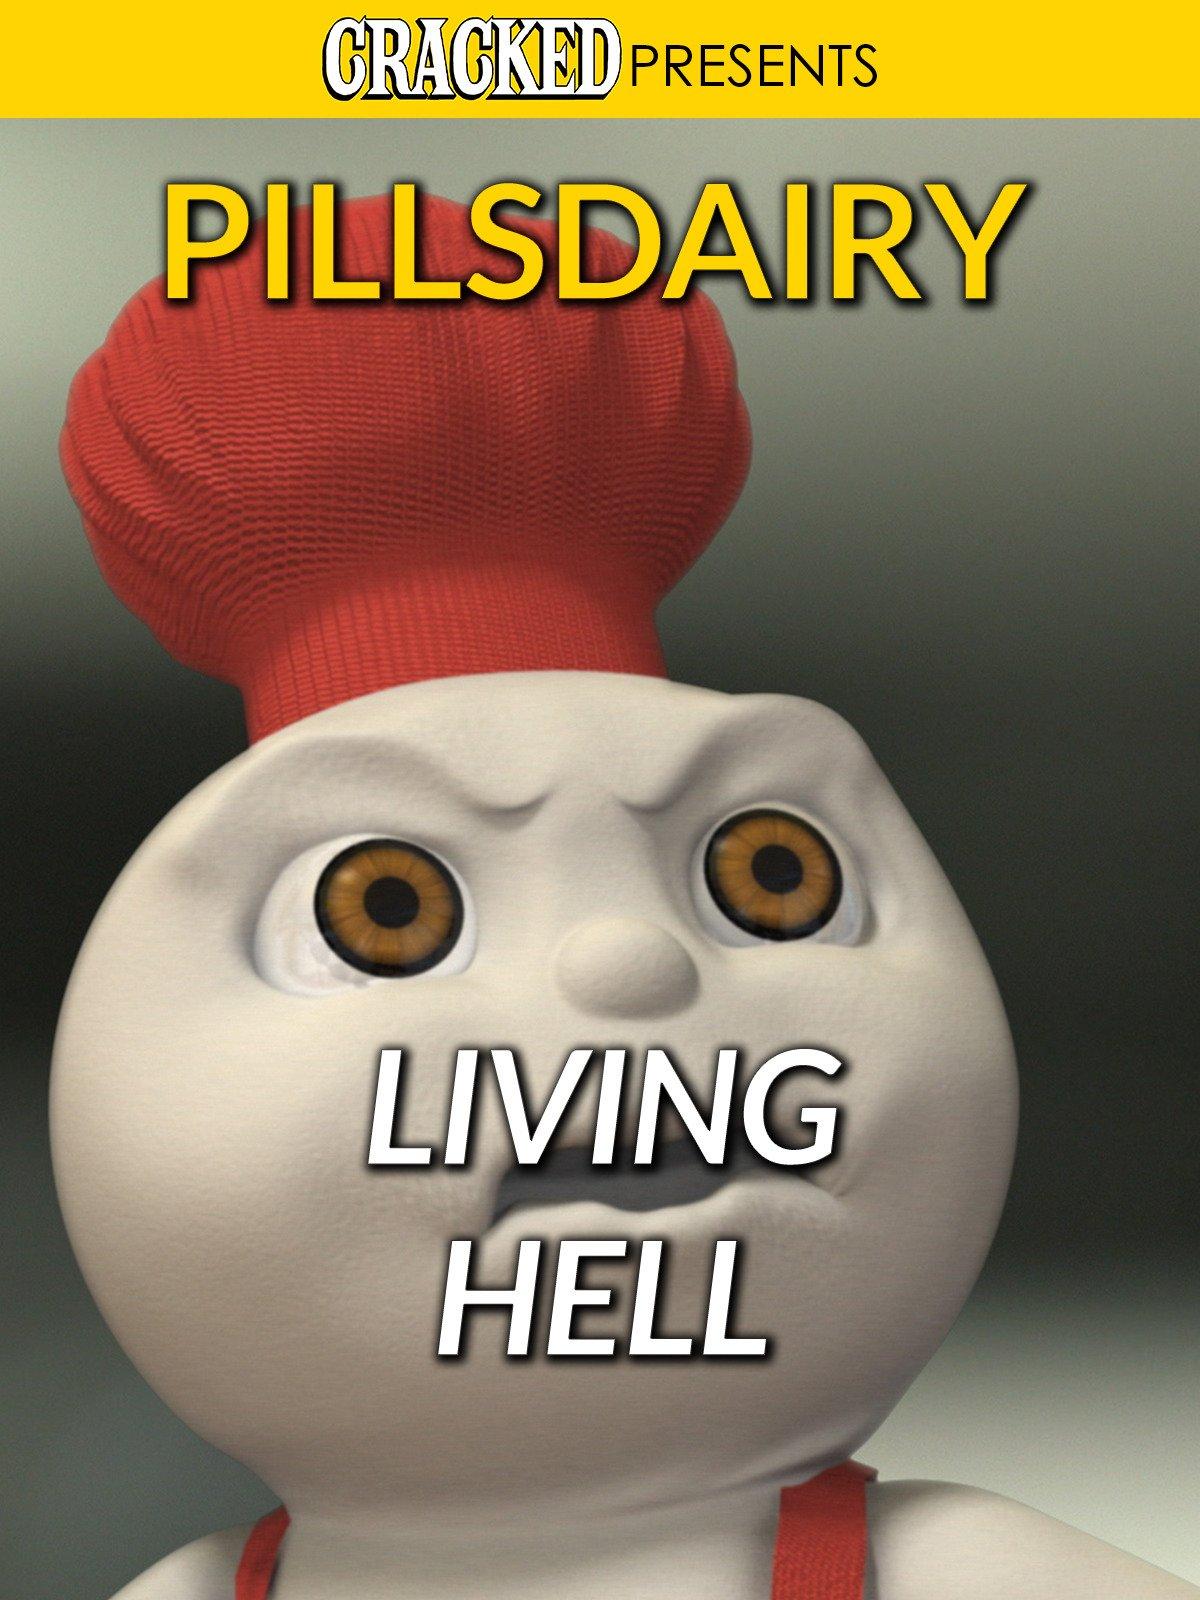 Pillsdairy living hell